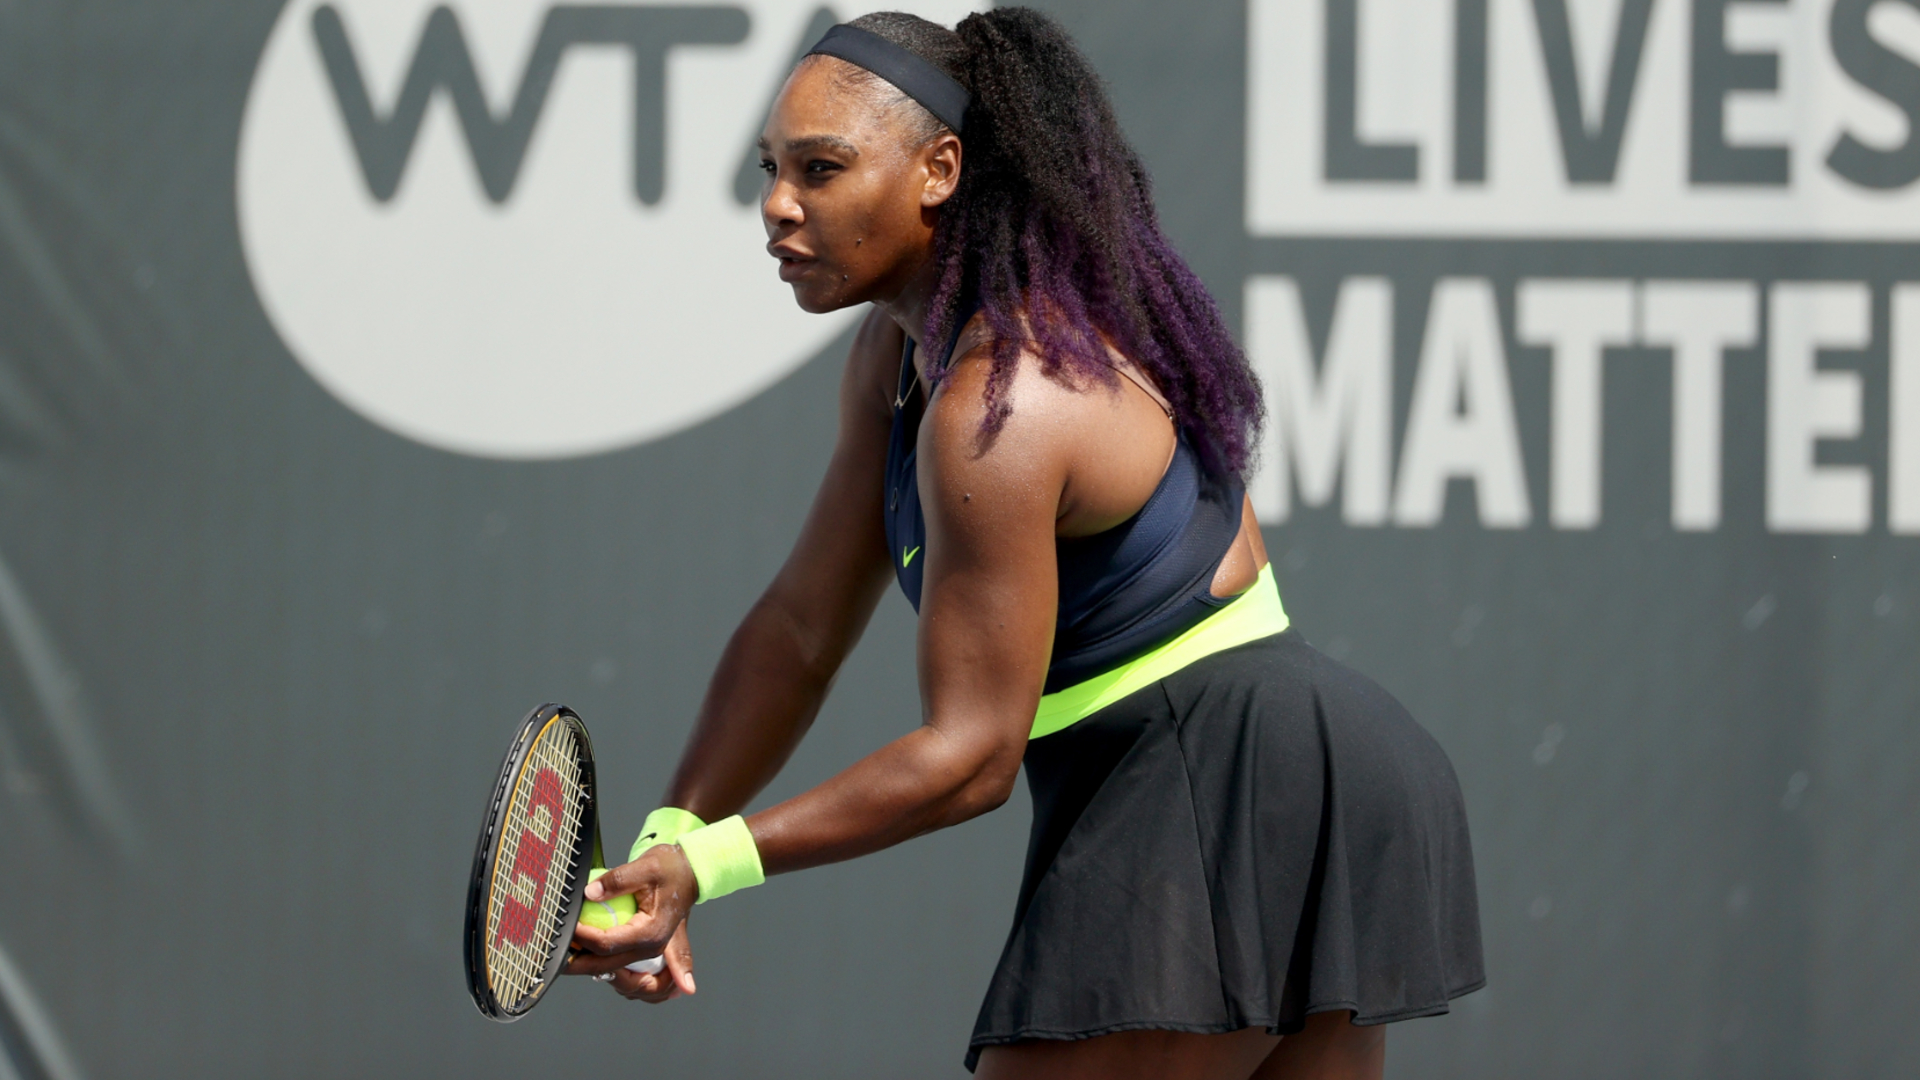 Serena Williams makes winning return in three-set battle with Pera